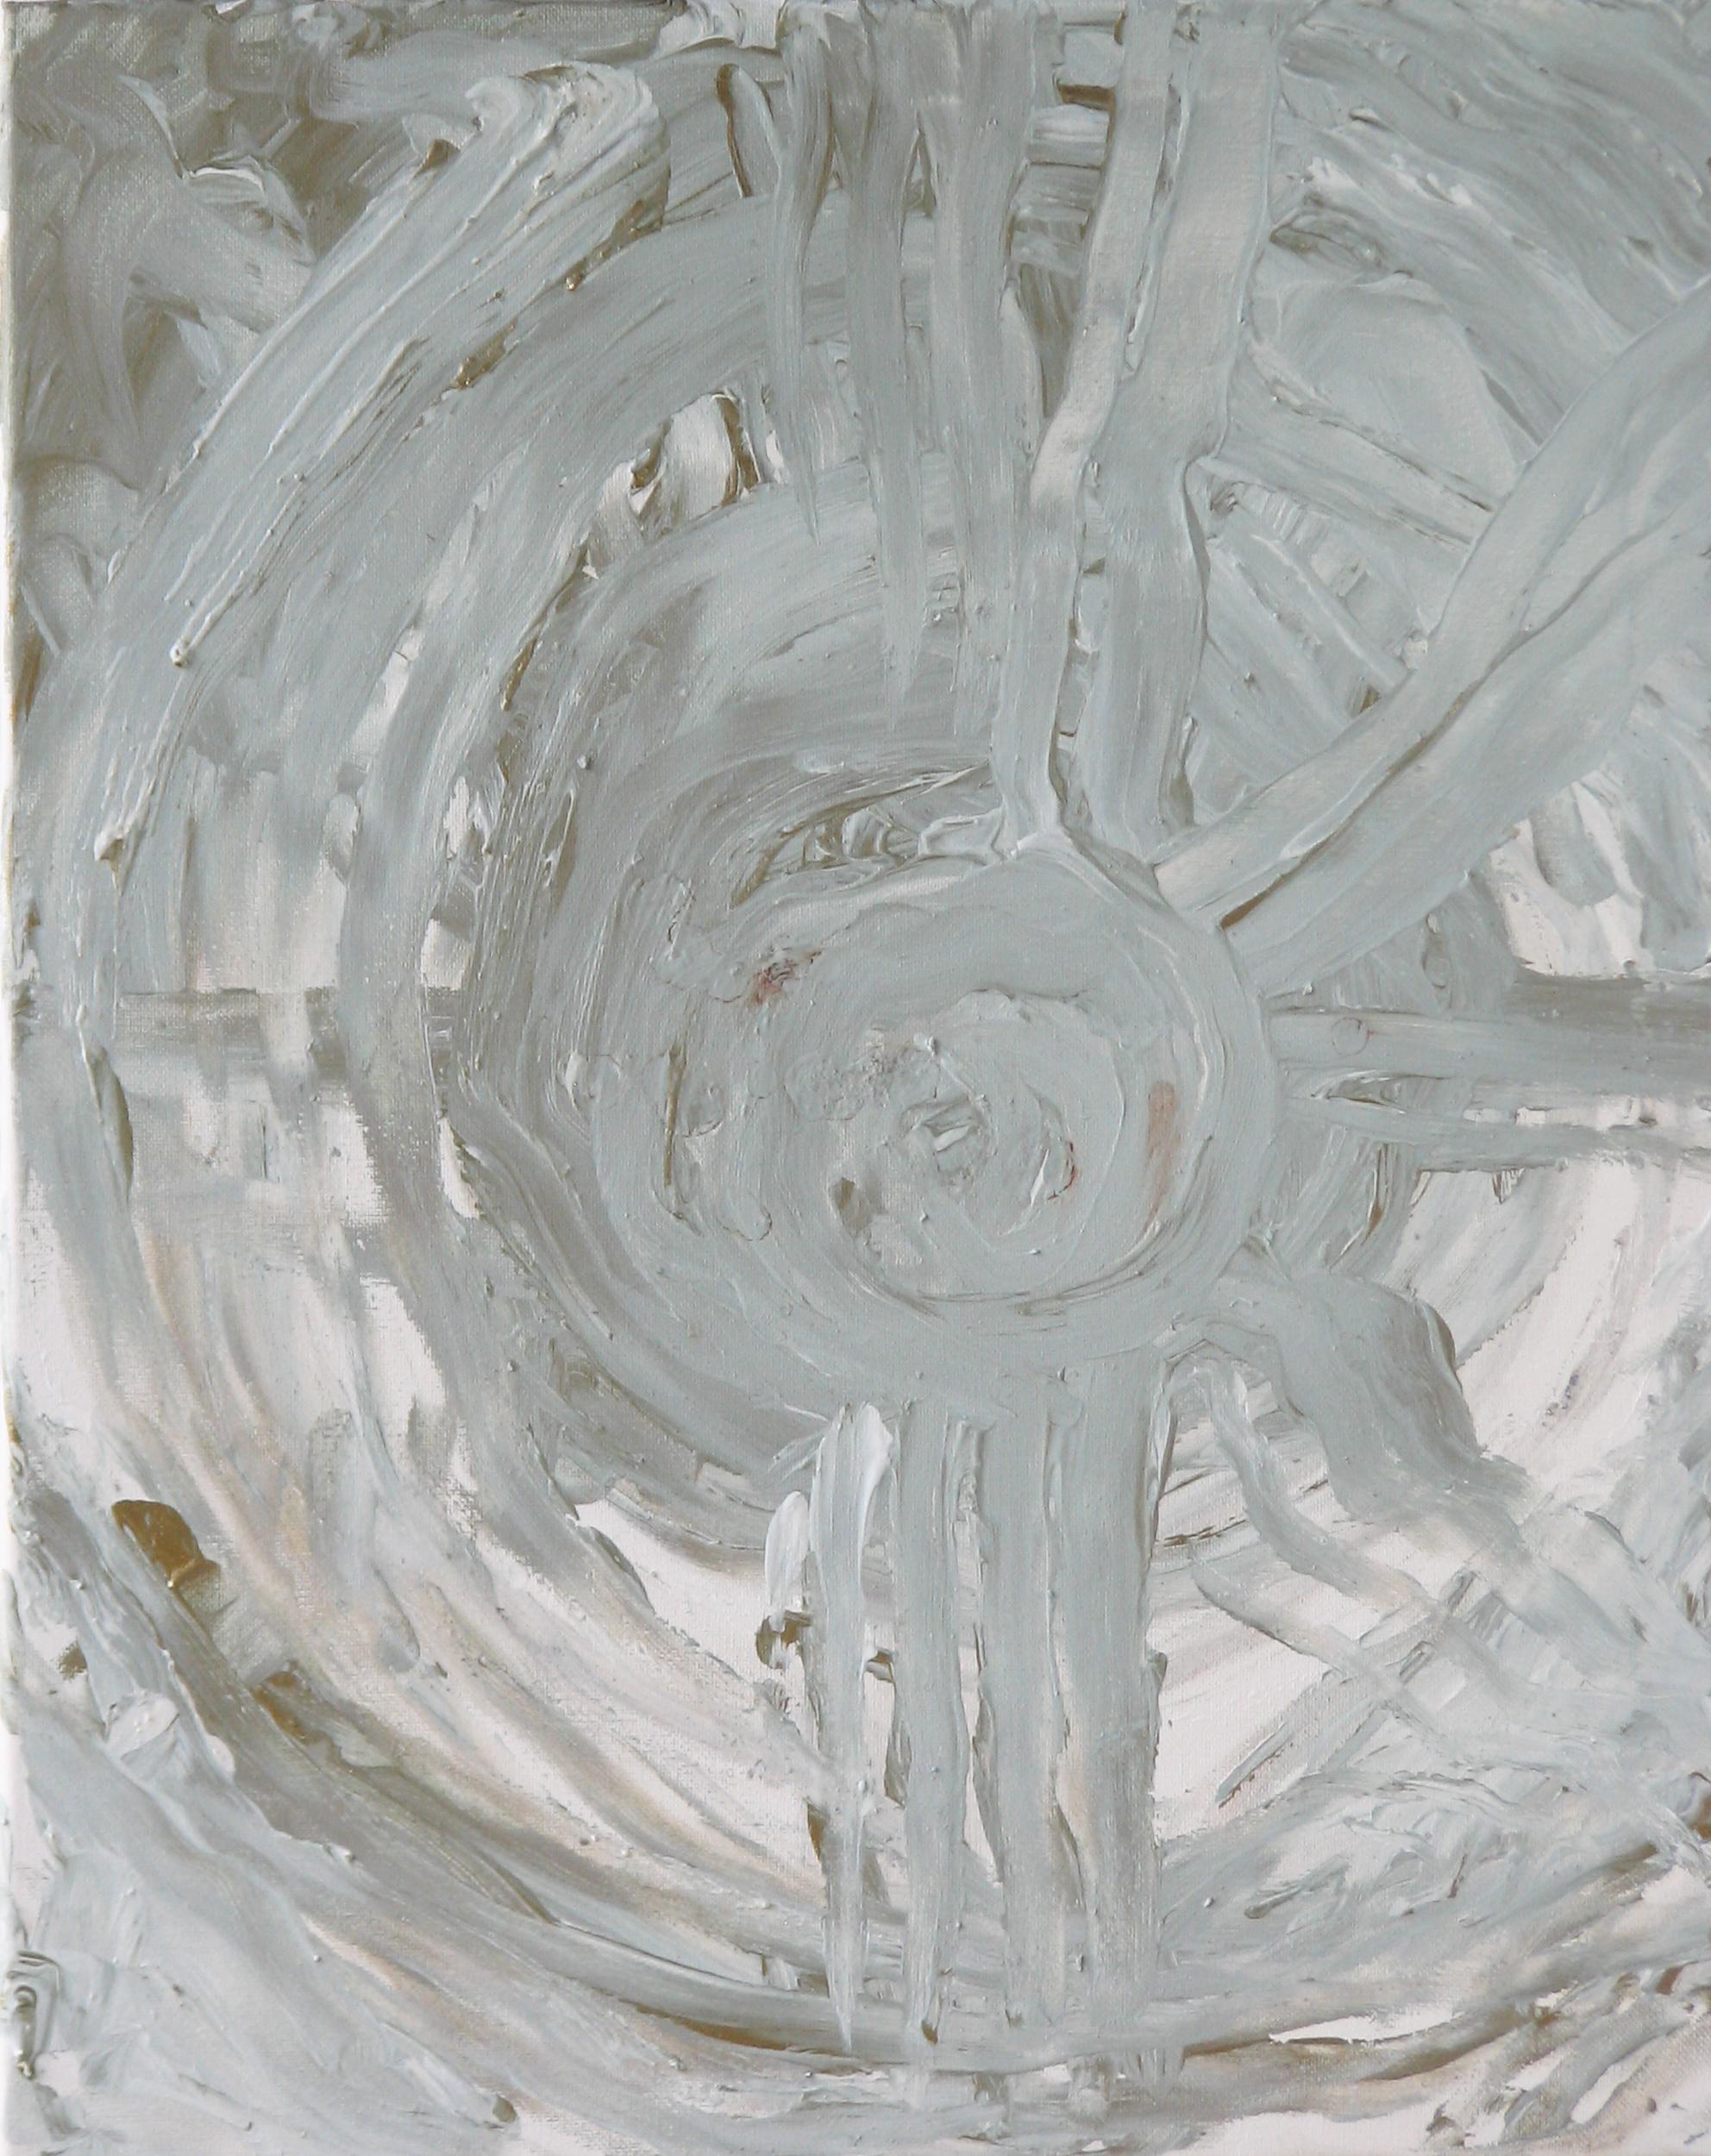 Dharma Wheel; acrylic and ash on canvas; 2017